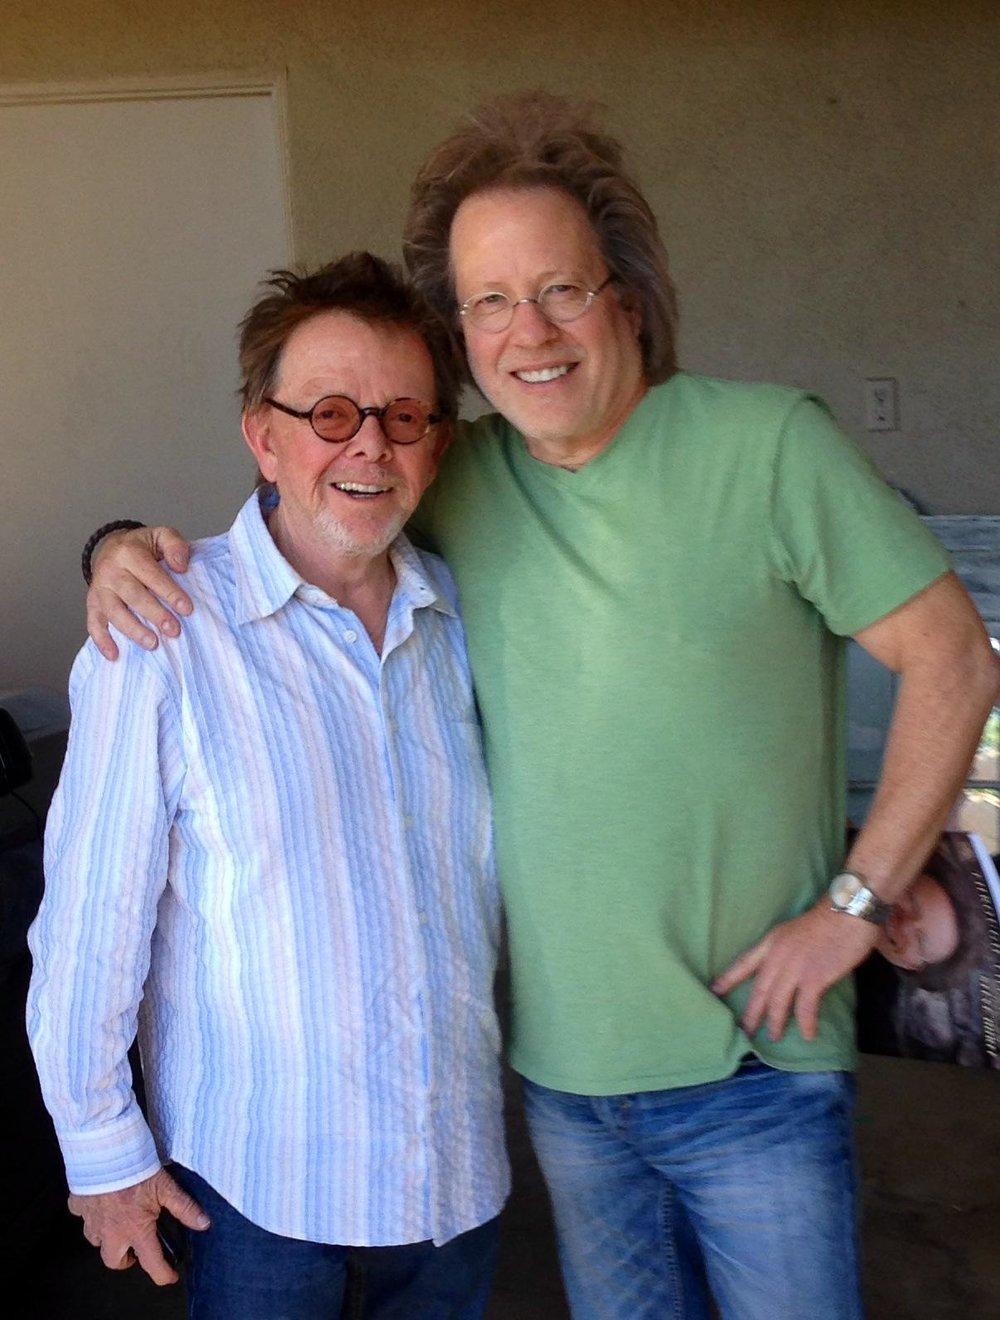 Steve & Paul Williams